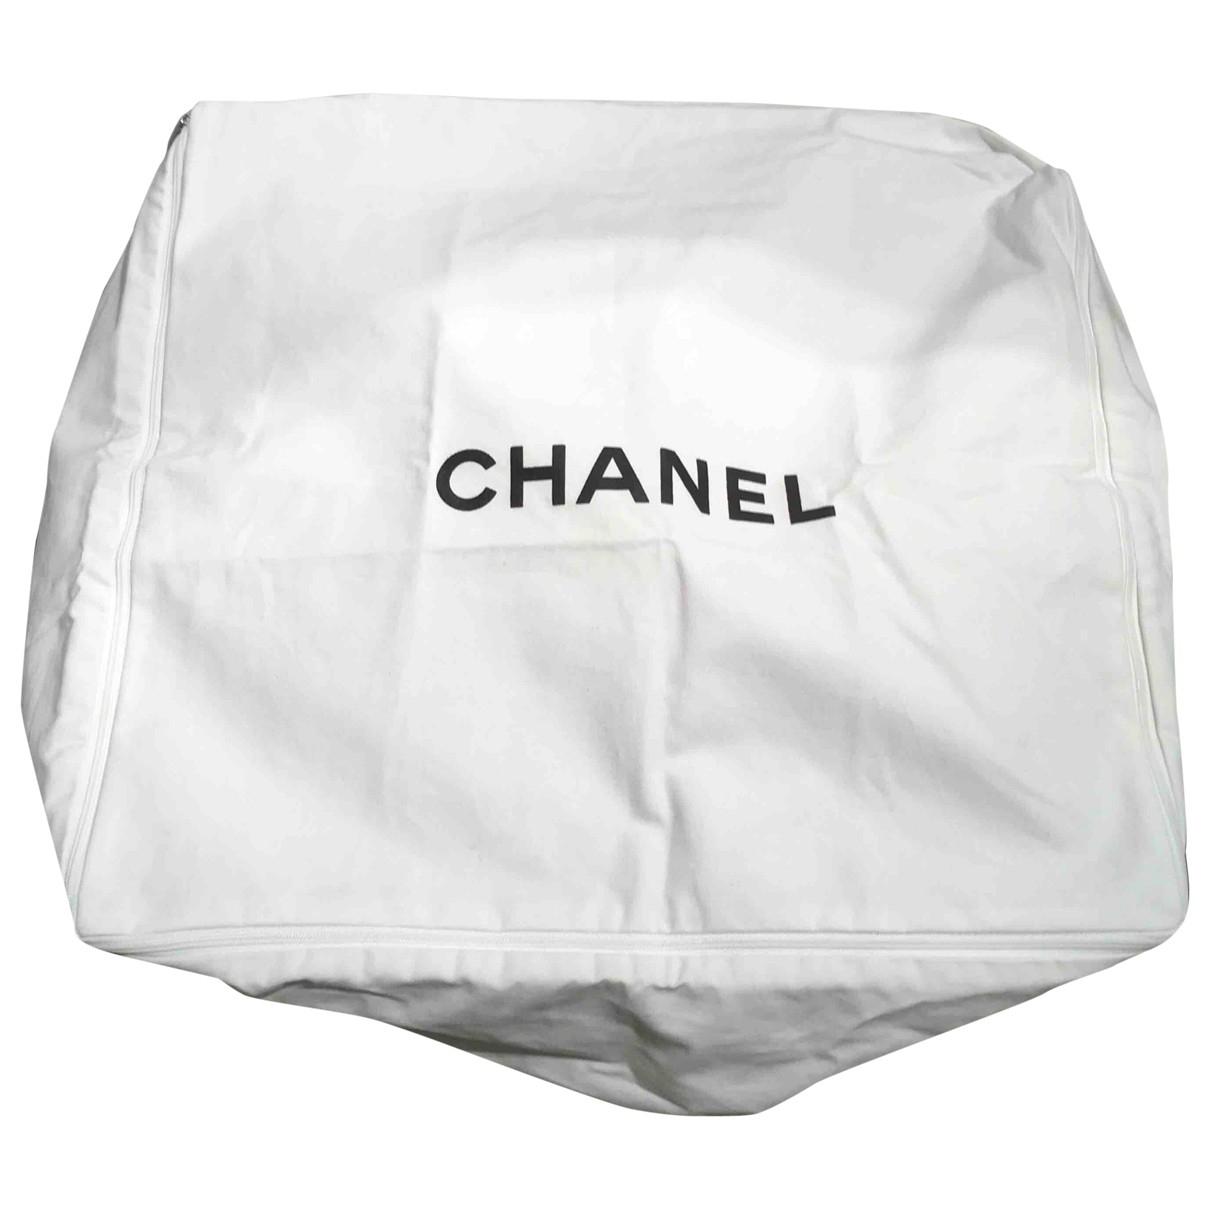 Cojin Chanel